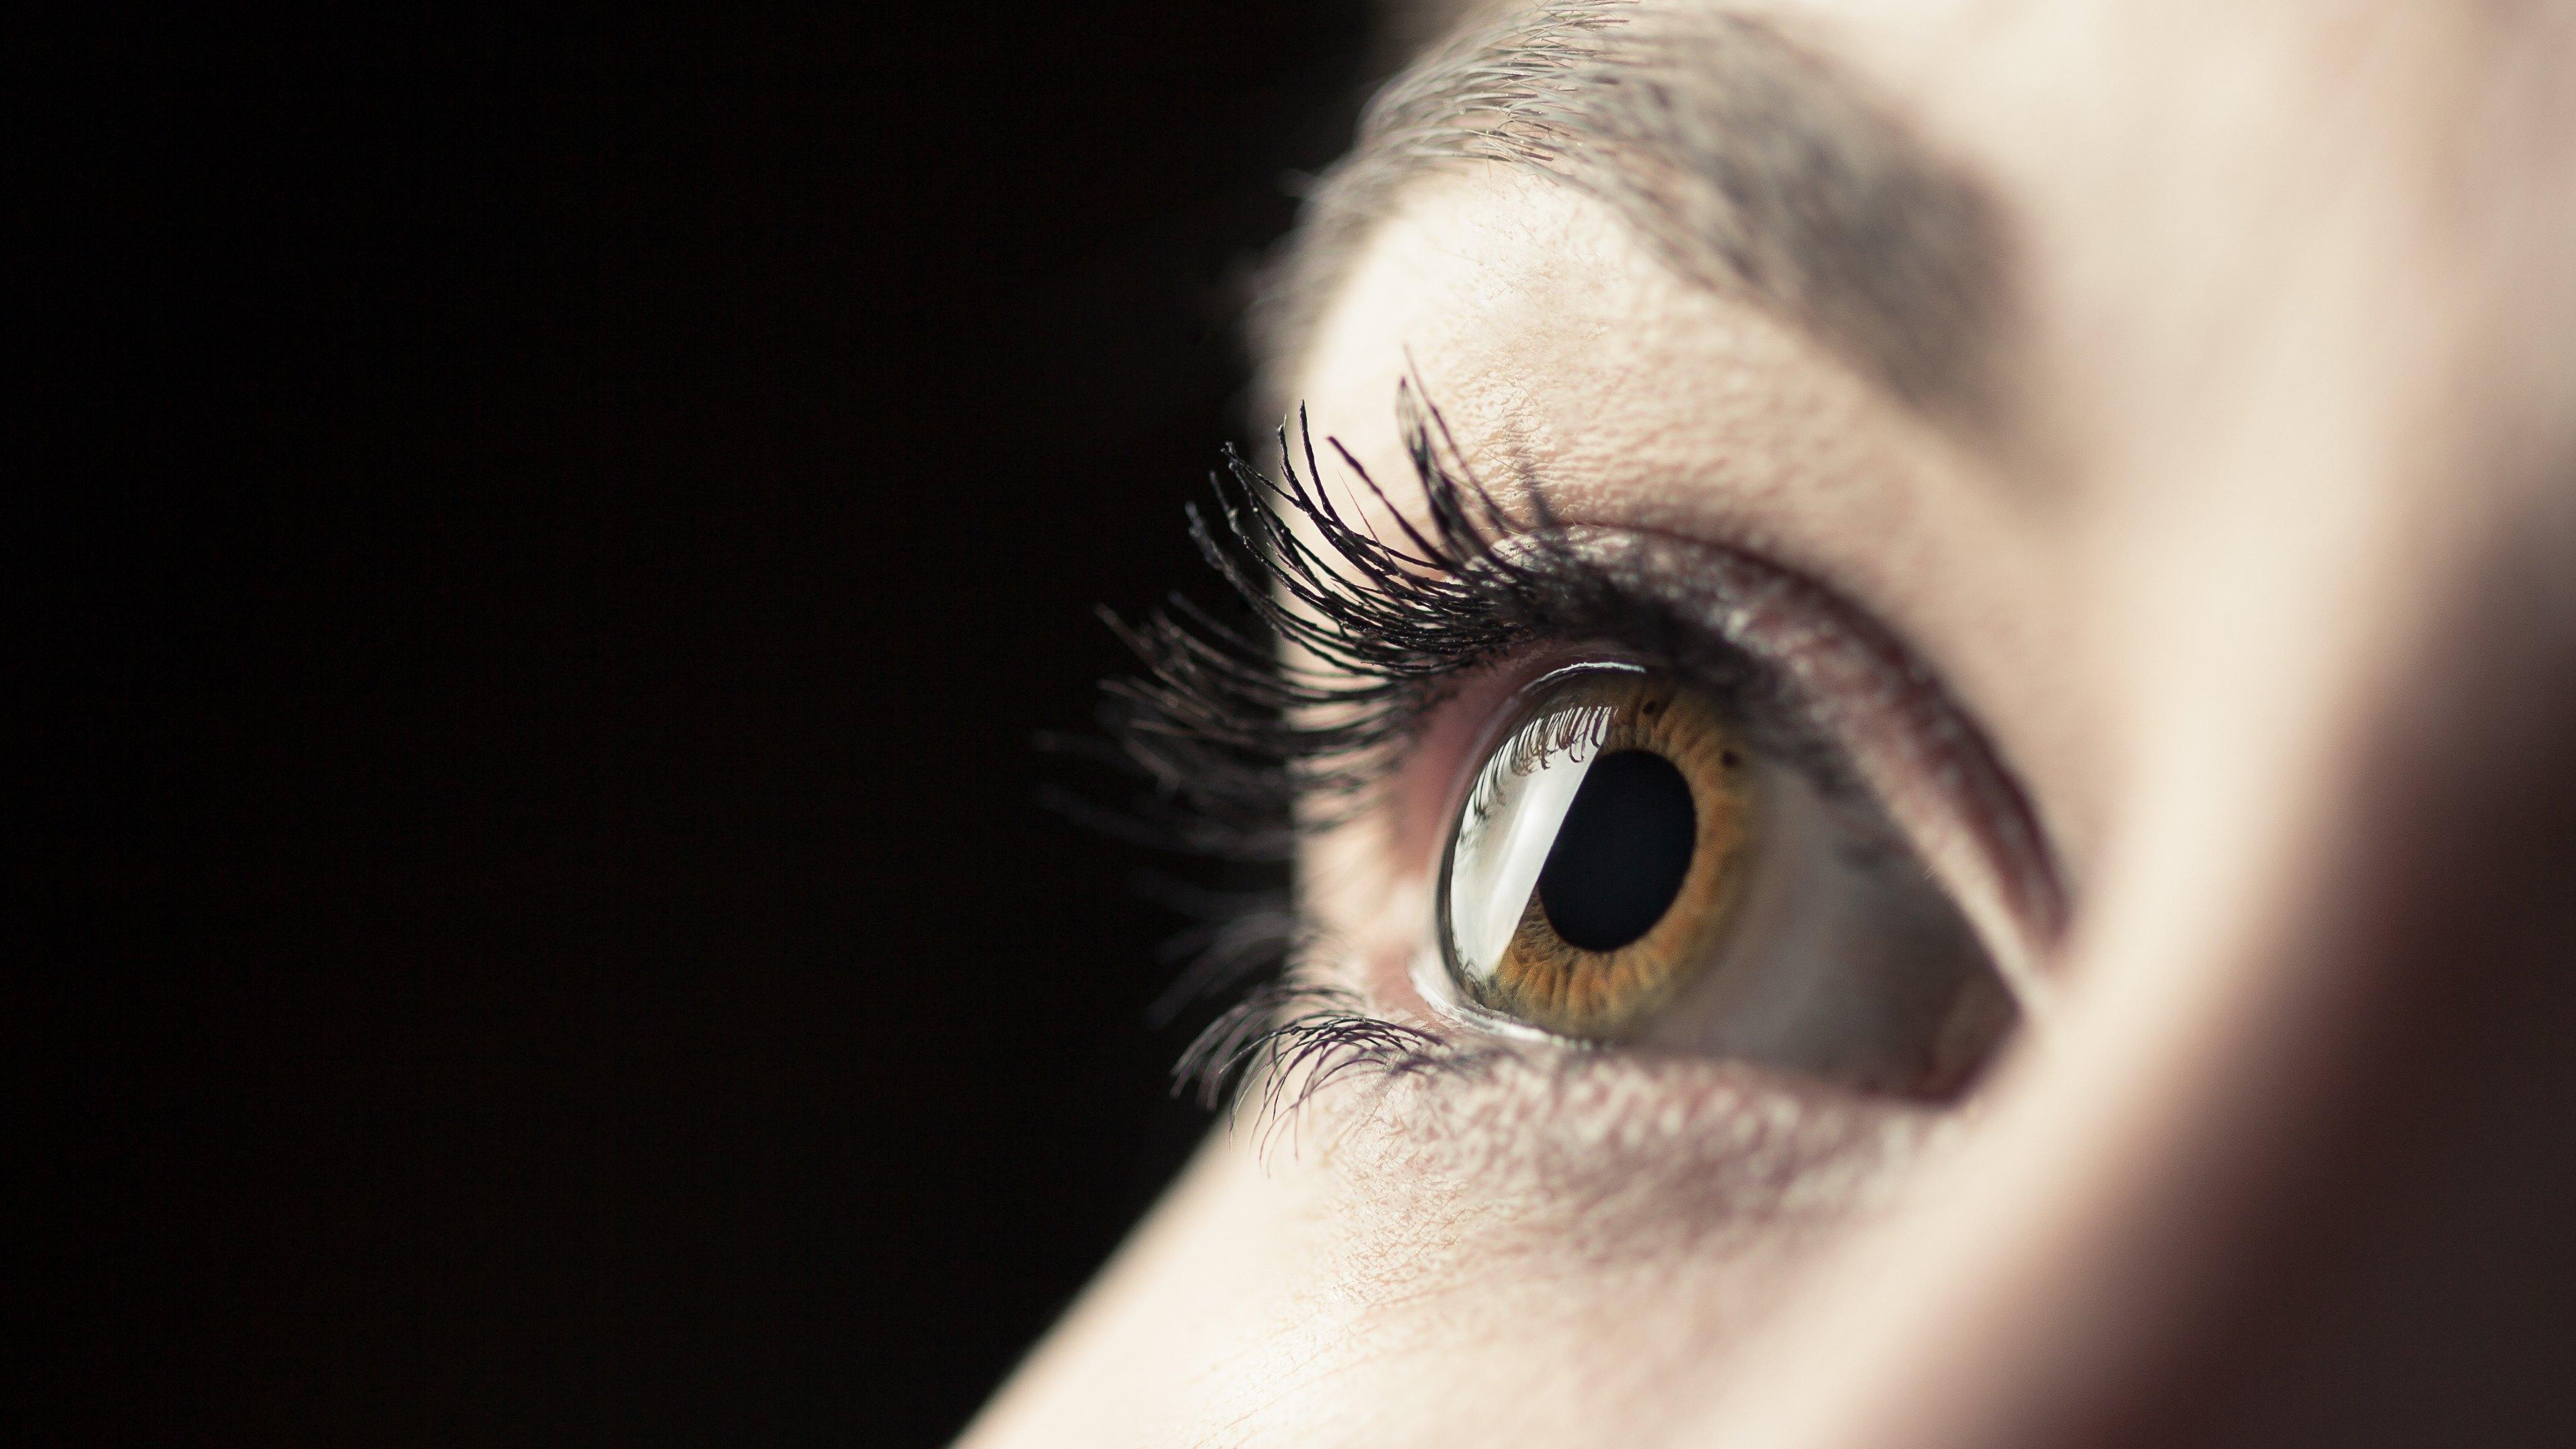 Eye Wallpaper Desktop 1080p Eye Wallpaper Hd 2908797 Hd Wallpaper Backgrounds Download